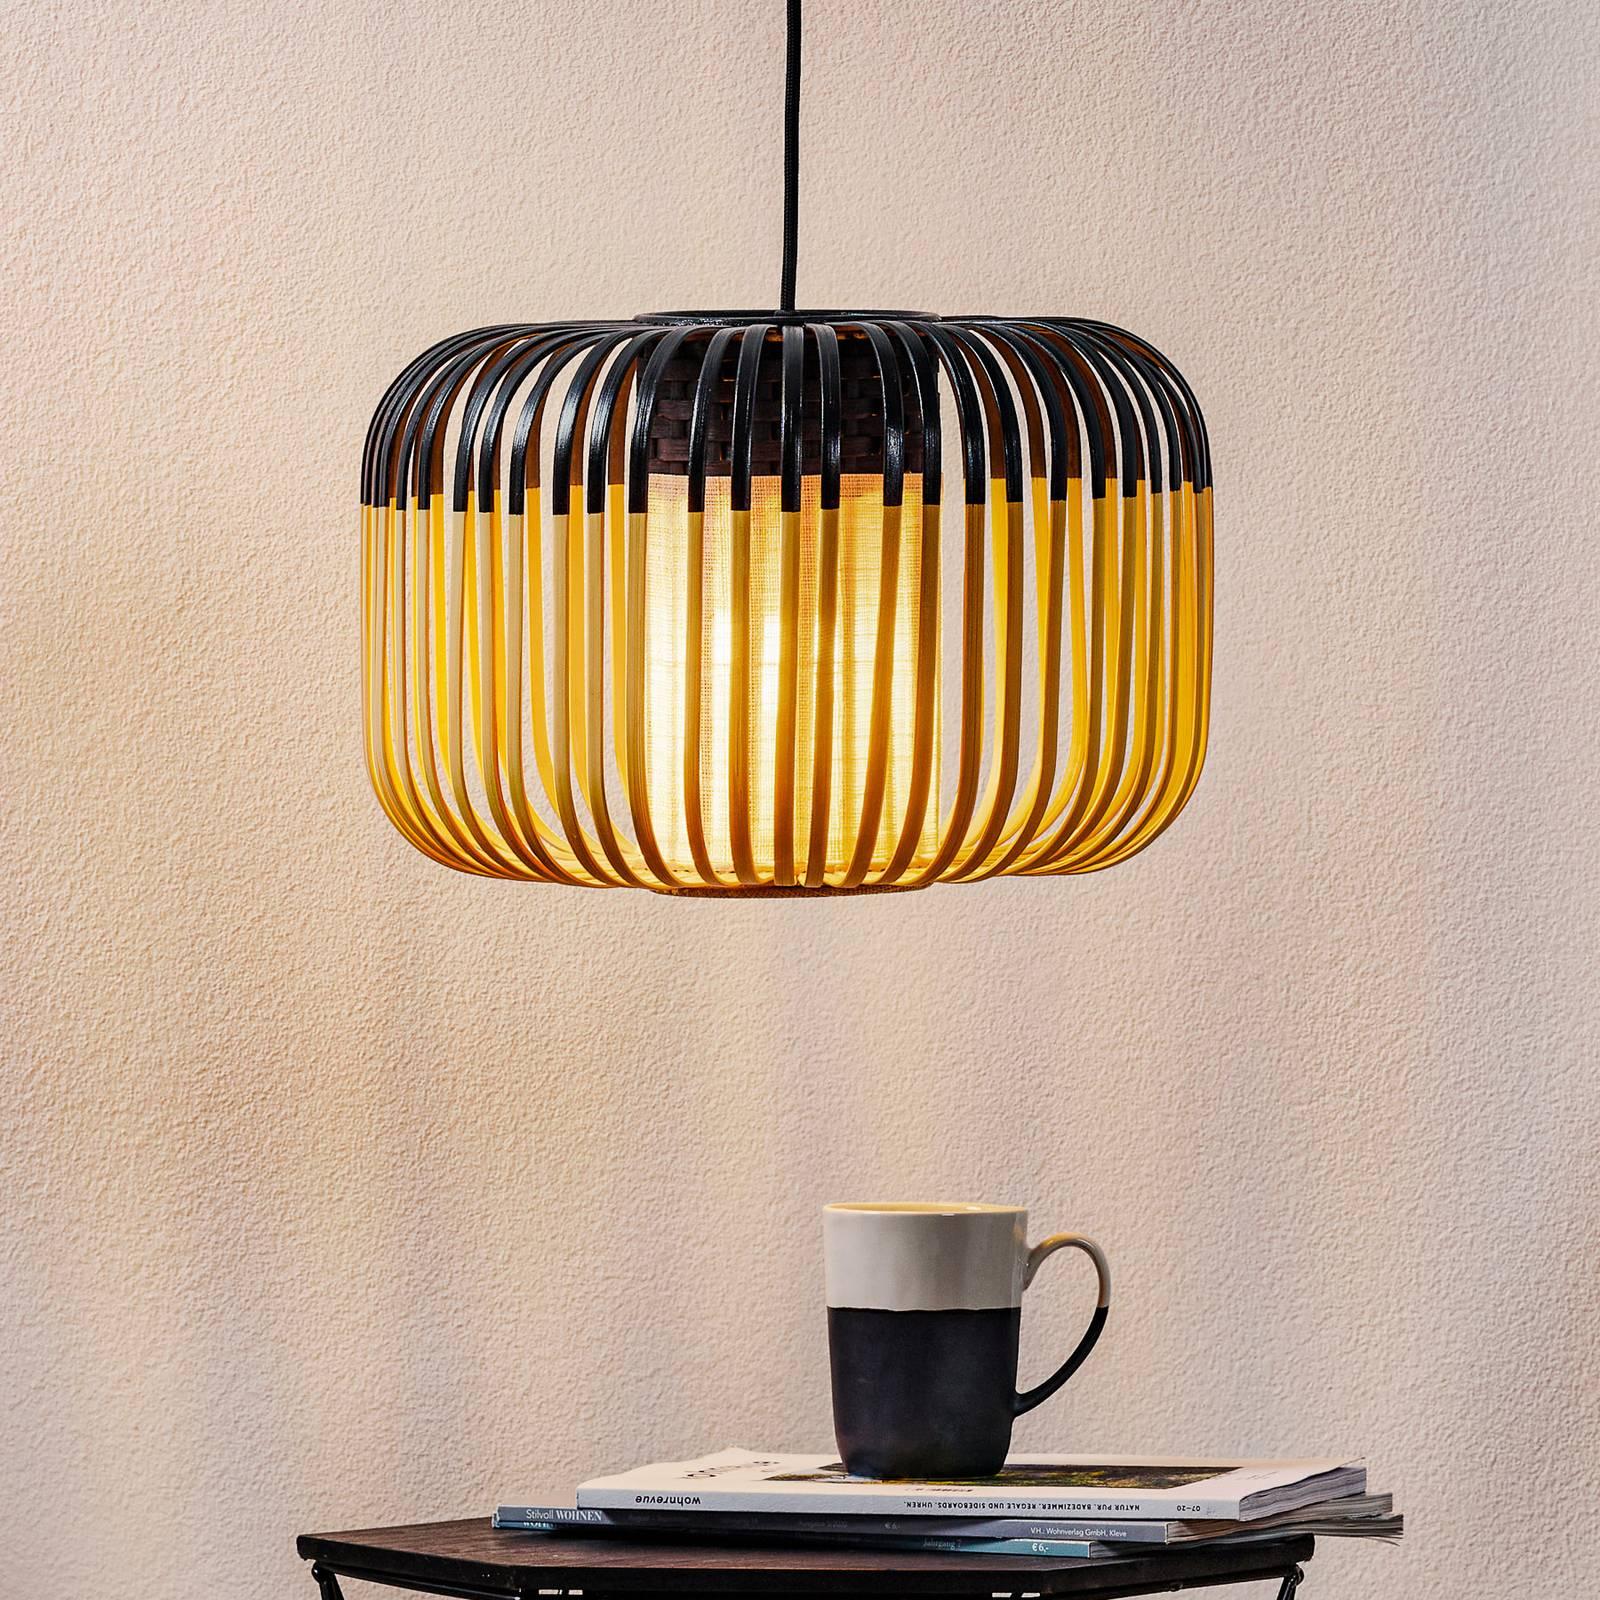 Forestier Bamboo Light S -riippuvalo 35 cm musta